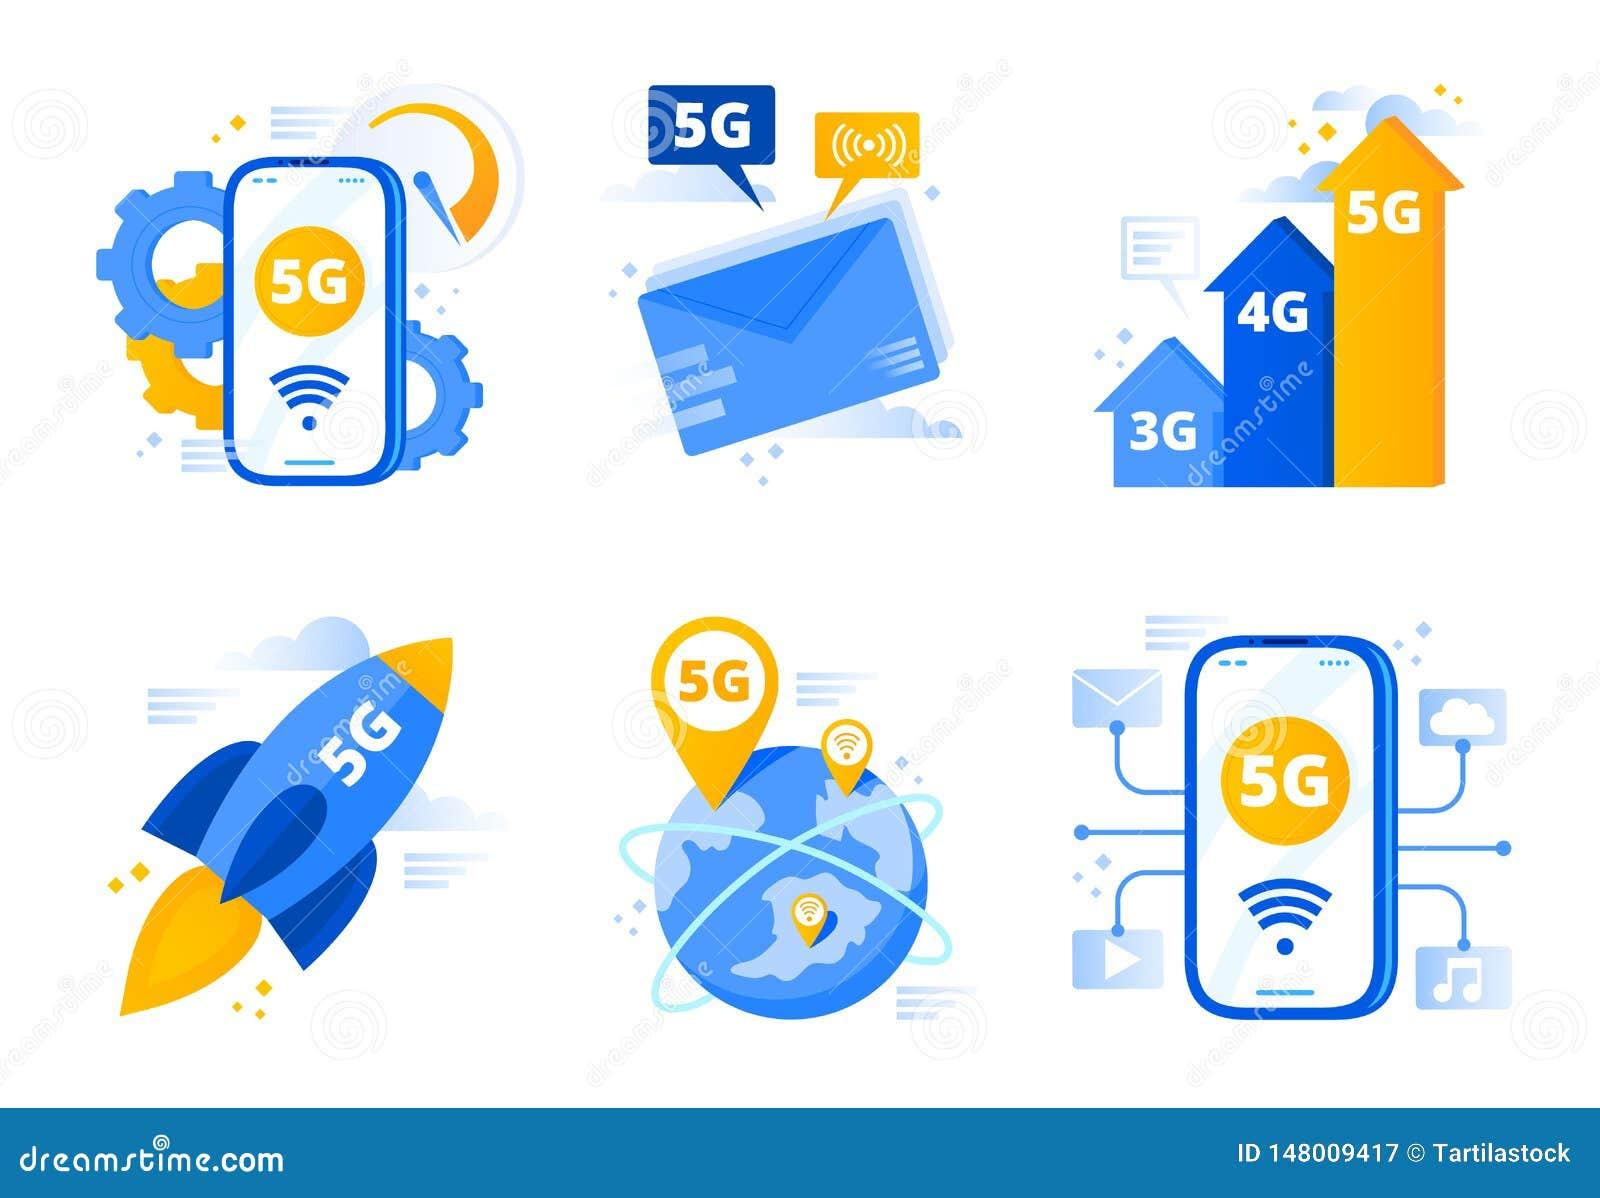 Network 5g. Fifth Generation Telecommunications, Fast ...